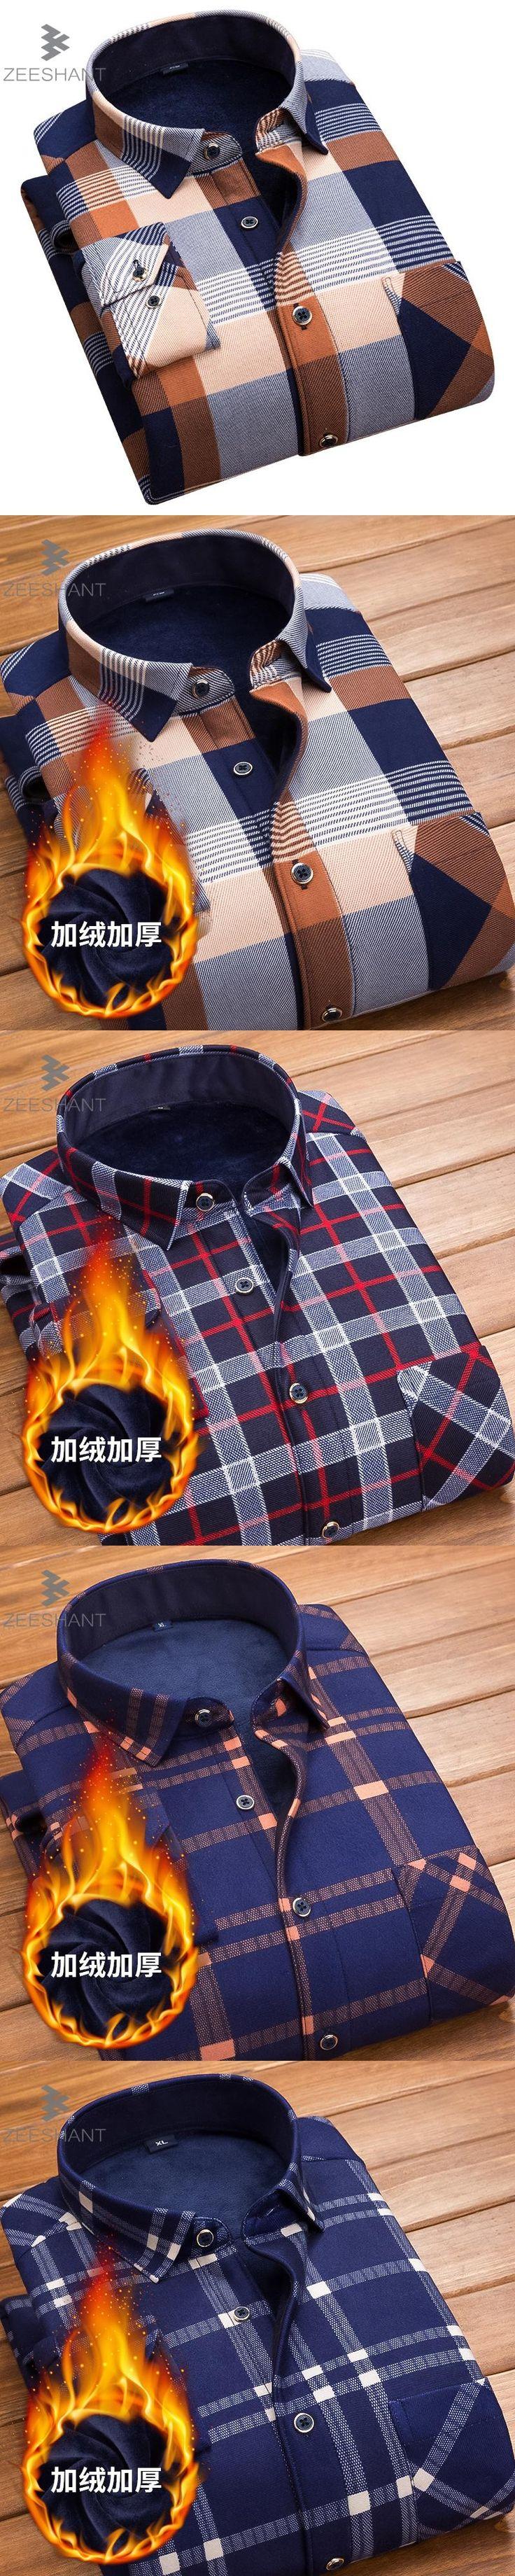 ZEESHANT 2017 Slim Fit Men Winter Long Sleeve Dress Shirt Warm Casual Vintage Cotton Mens Formal Shirt Camisa Masculina 4XL